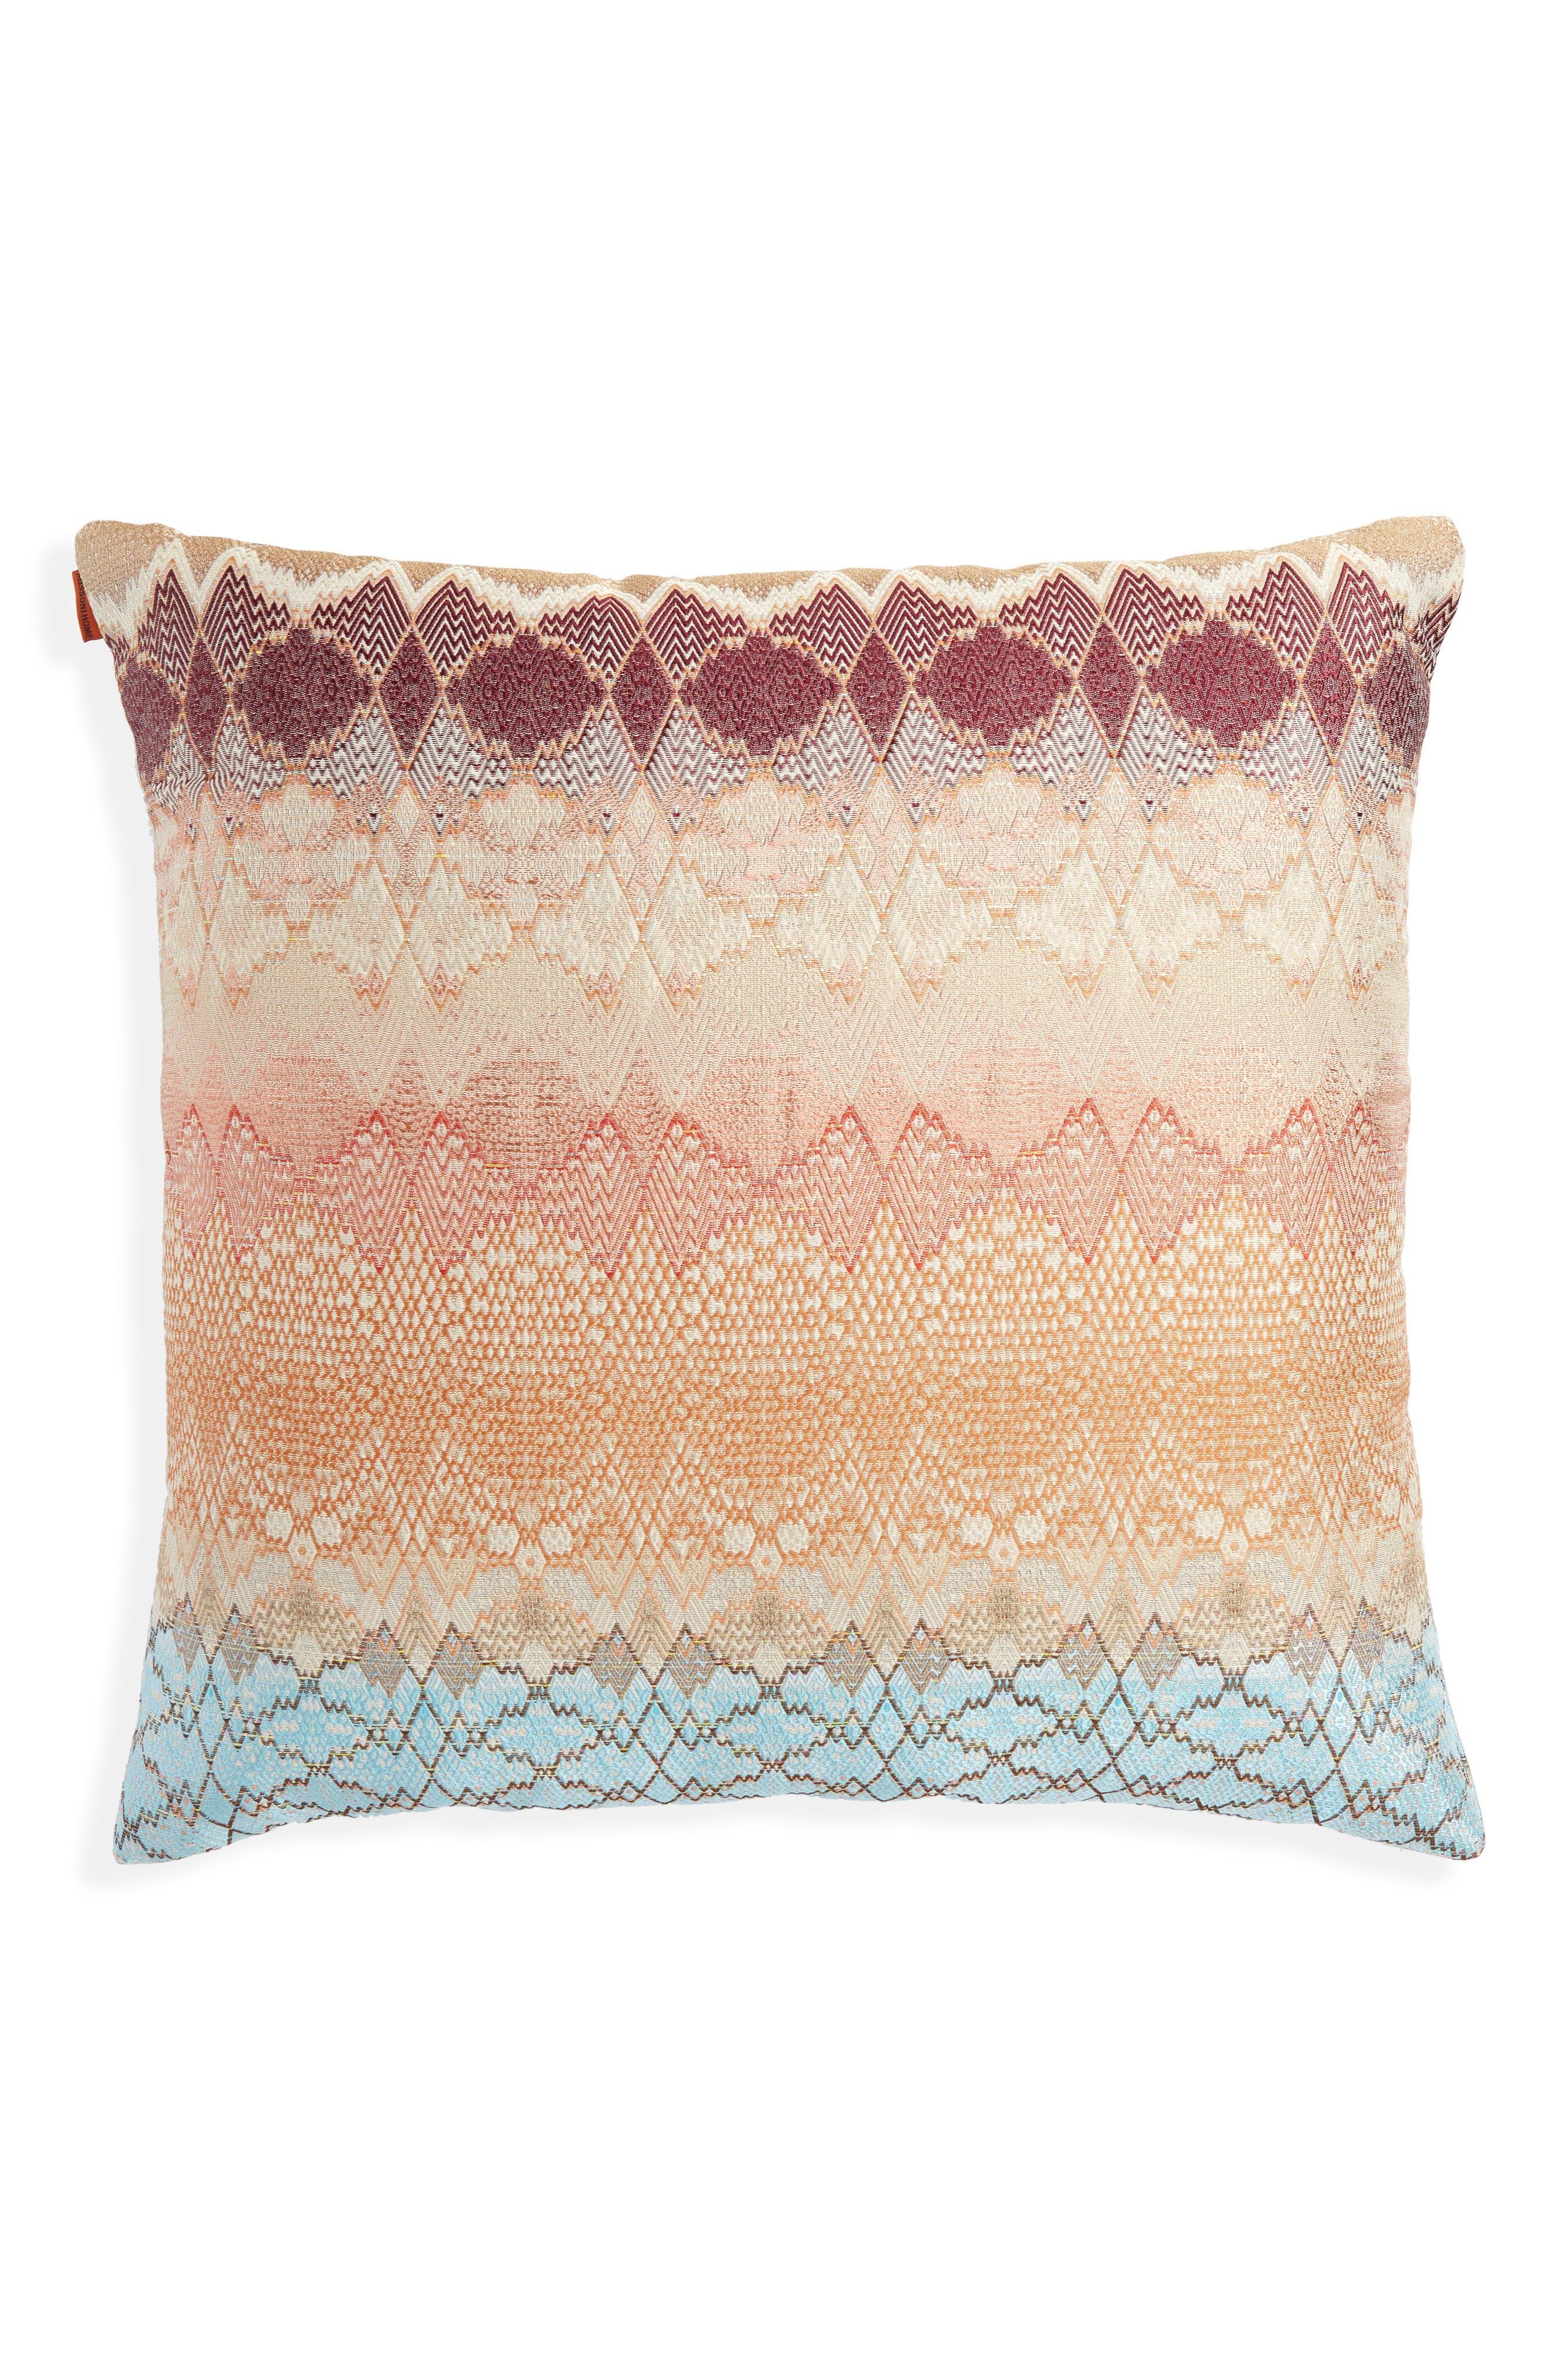 Missoni Tbilissi Accent Pillow